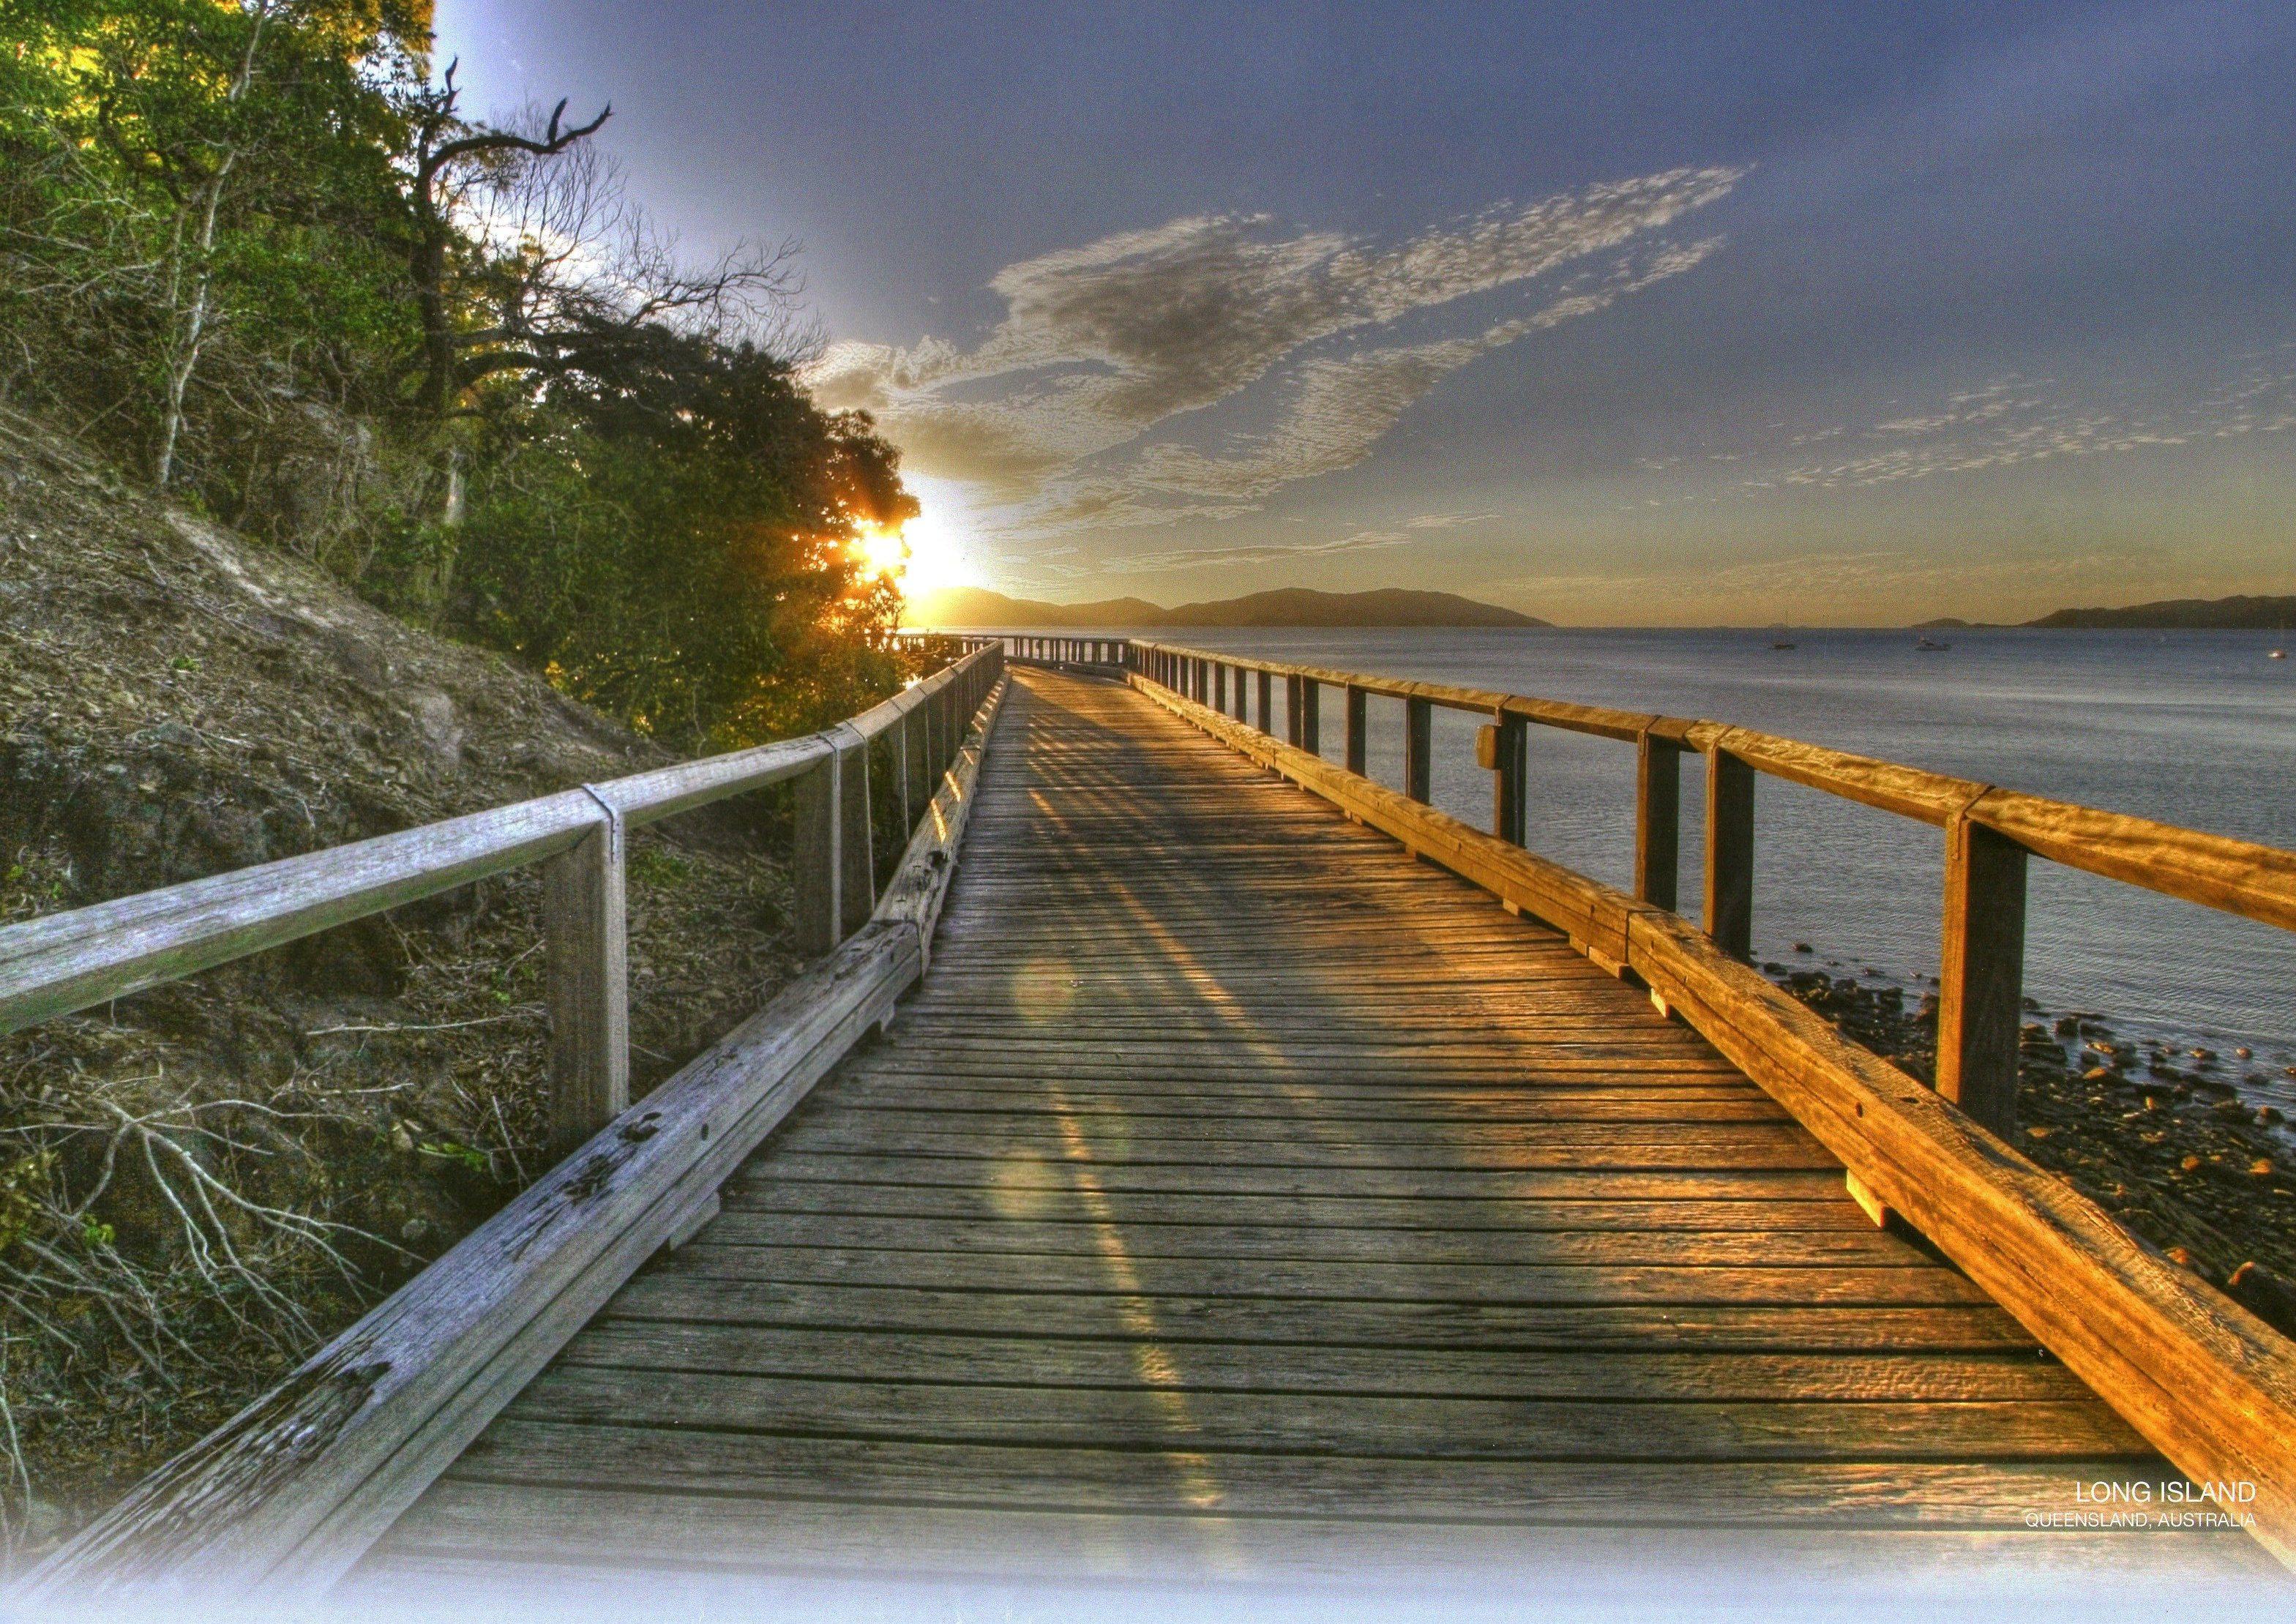 LONG ISLAND QUEENSLAND AUSTRALIA WALLPAPER   114919   HD Wallpapers 3137x2219